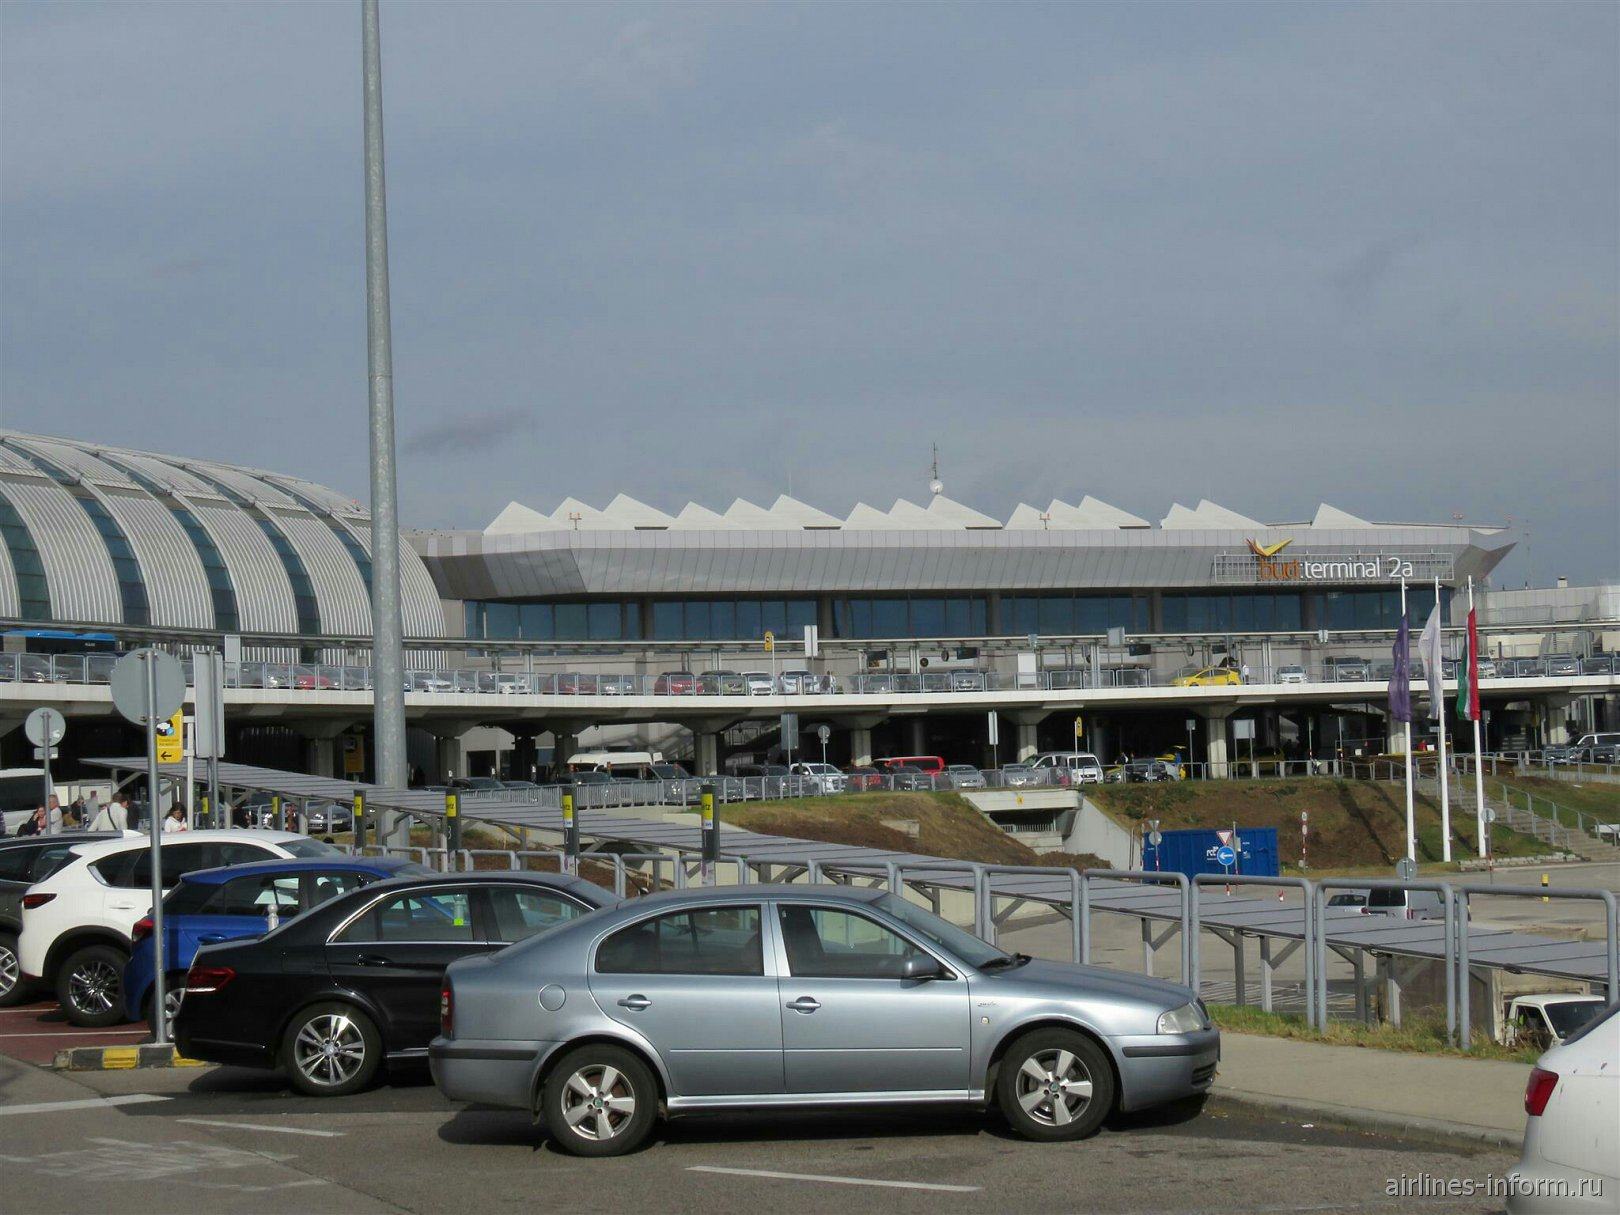 Терминал 2а аэропорта Будапешта